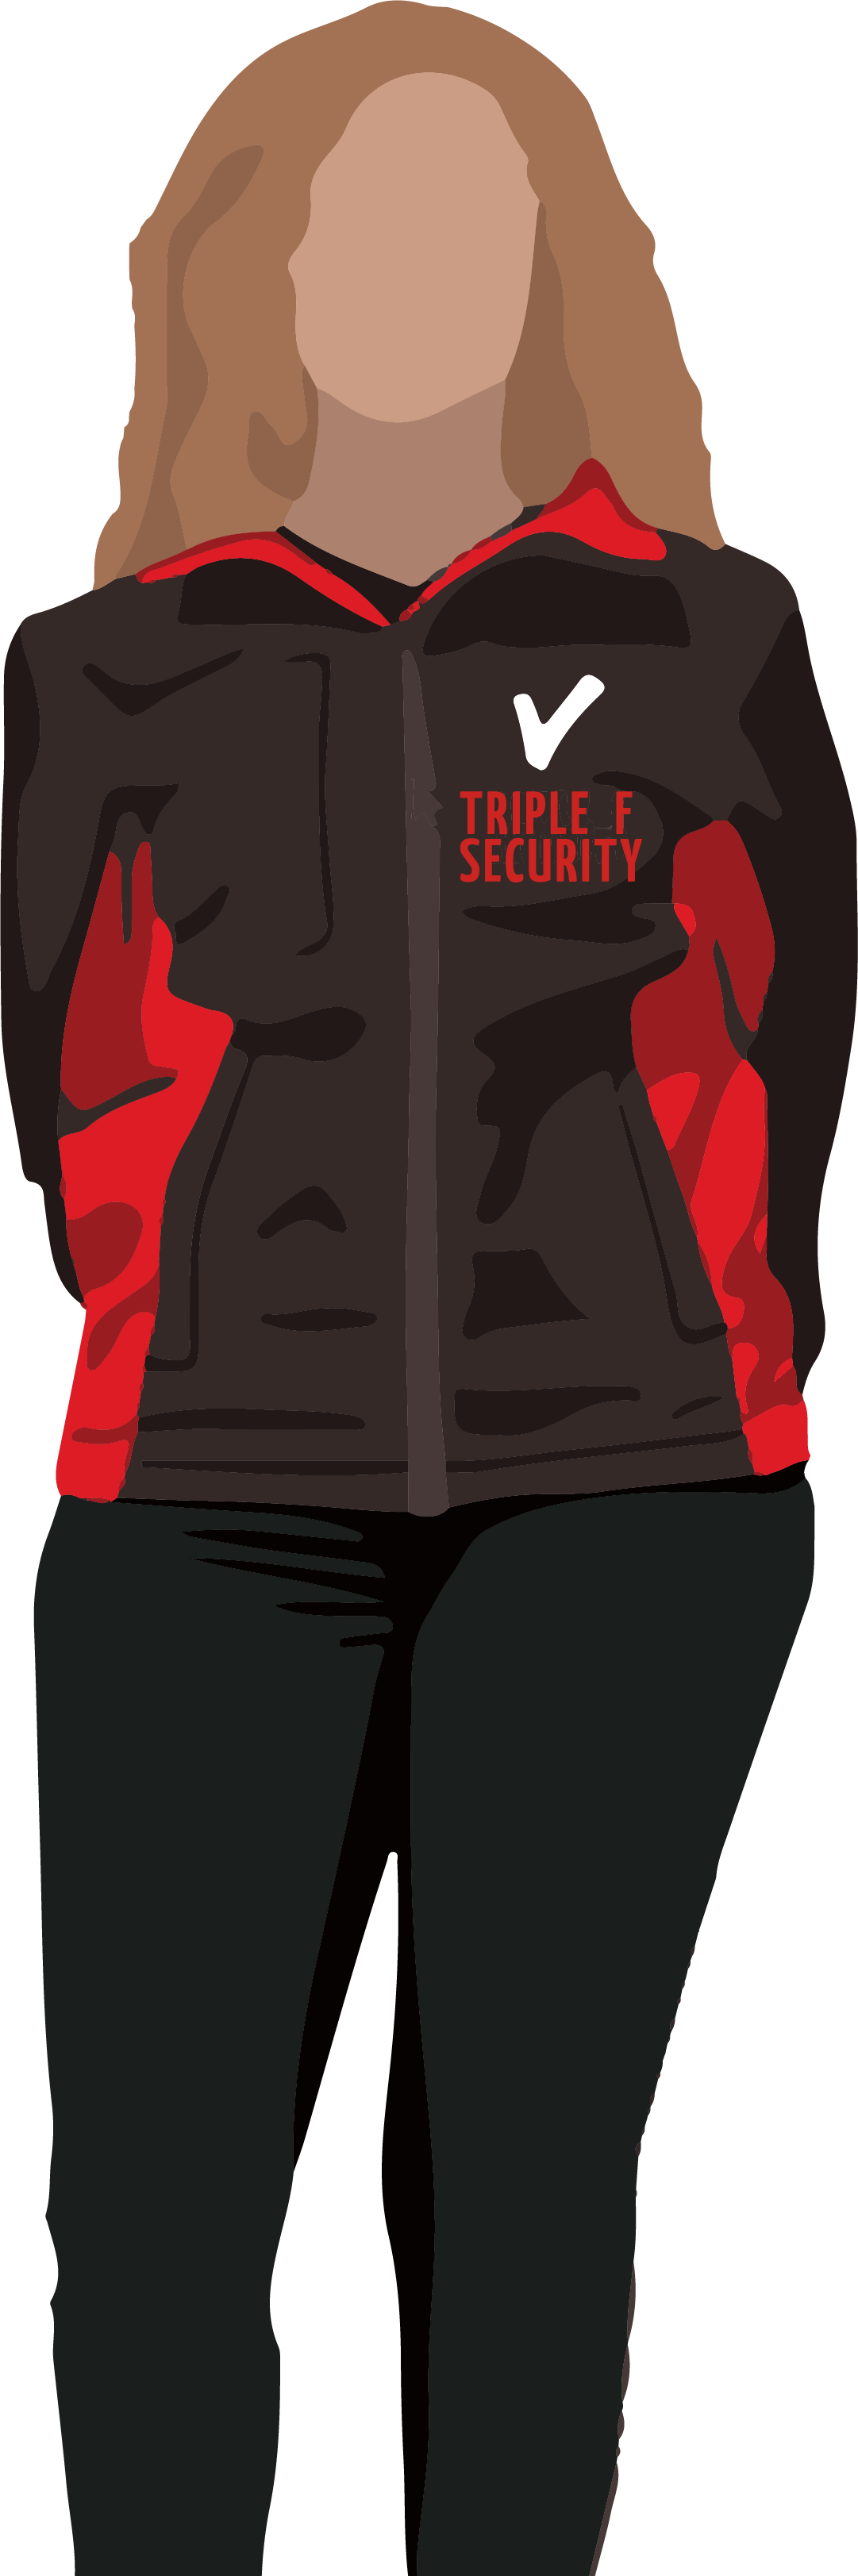 Event Security Officer bij Triple F Security